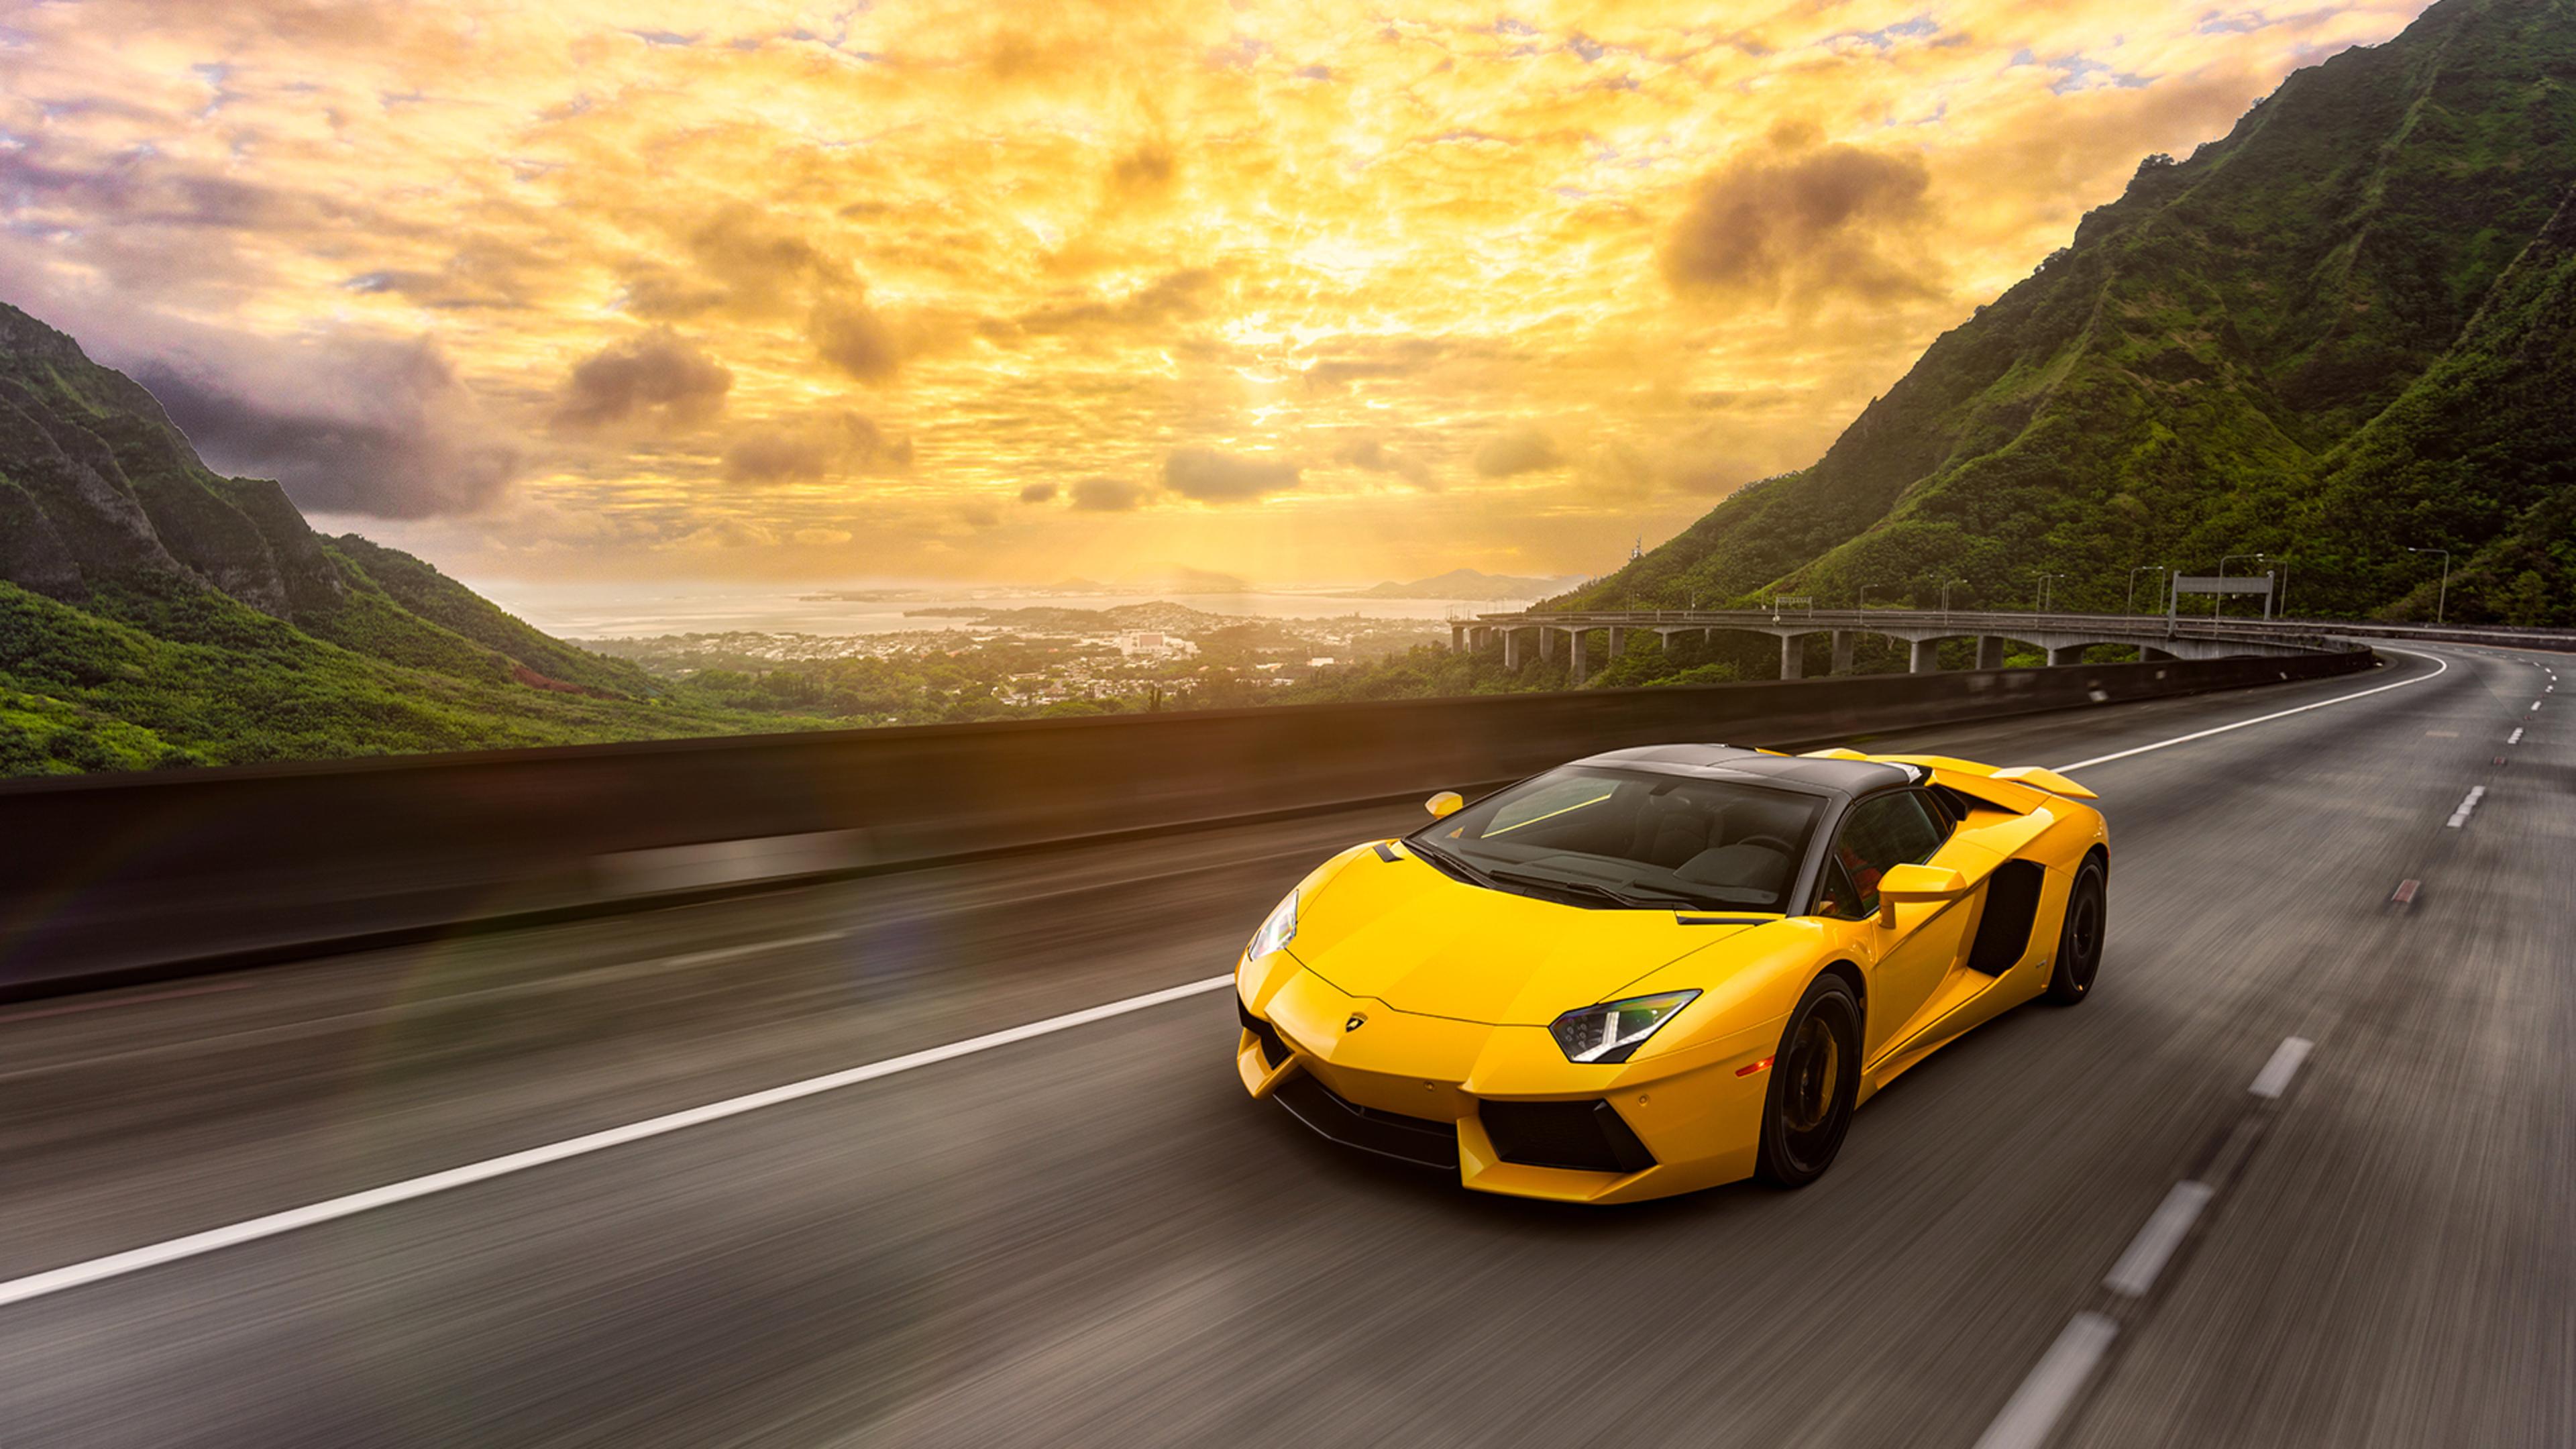 3840x2160 Lamborghini Aventador 2016 1 4k HD 4k Wallpapers ...